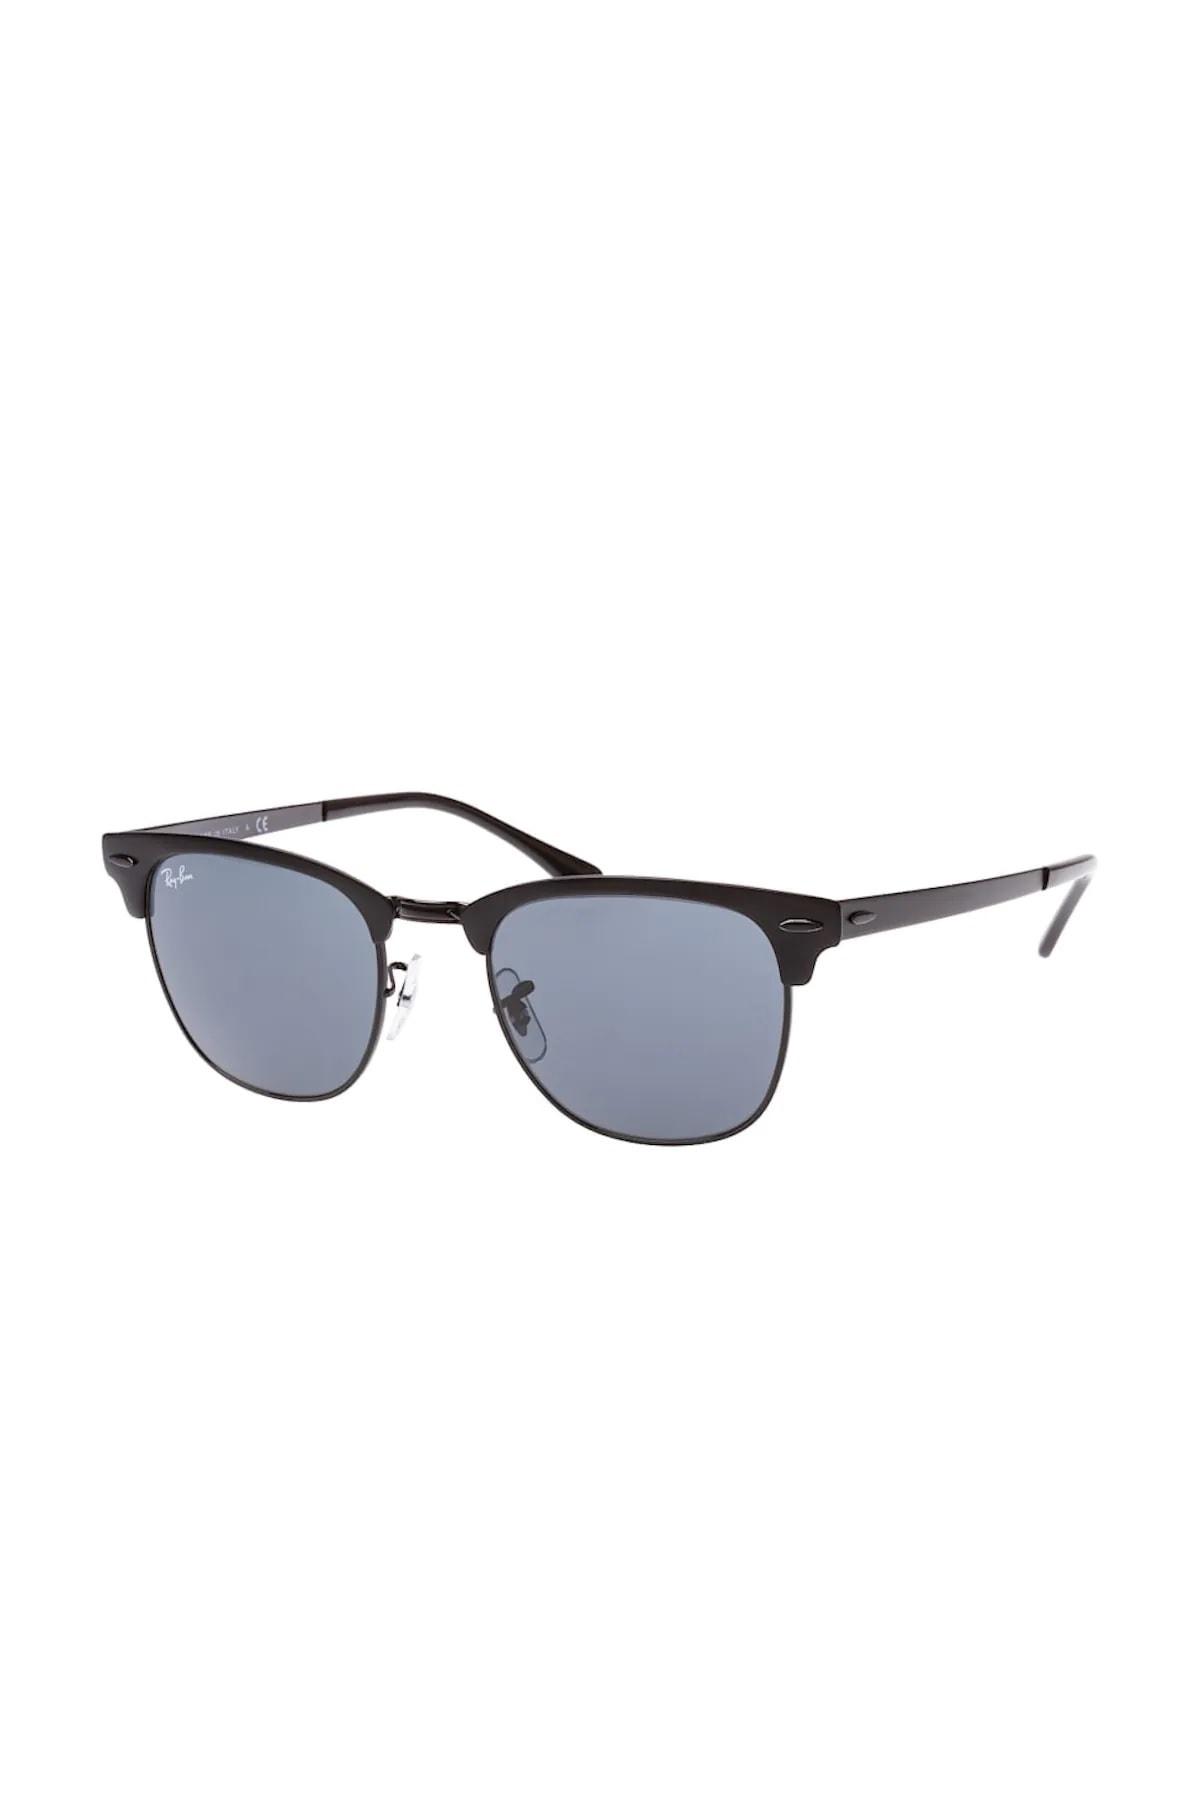 عینک آفتابی زنانه ترک مجلسی برند ری بن رنگ مشکی کد ty96174001